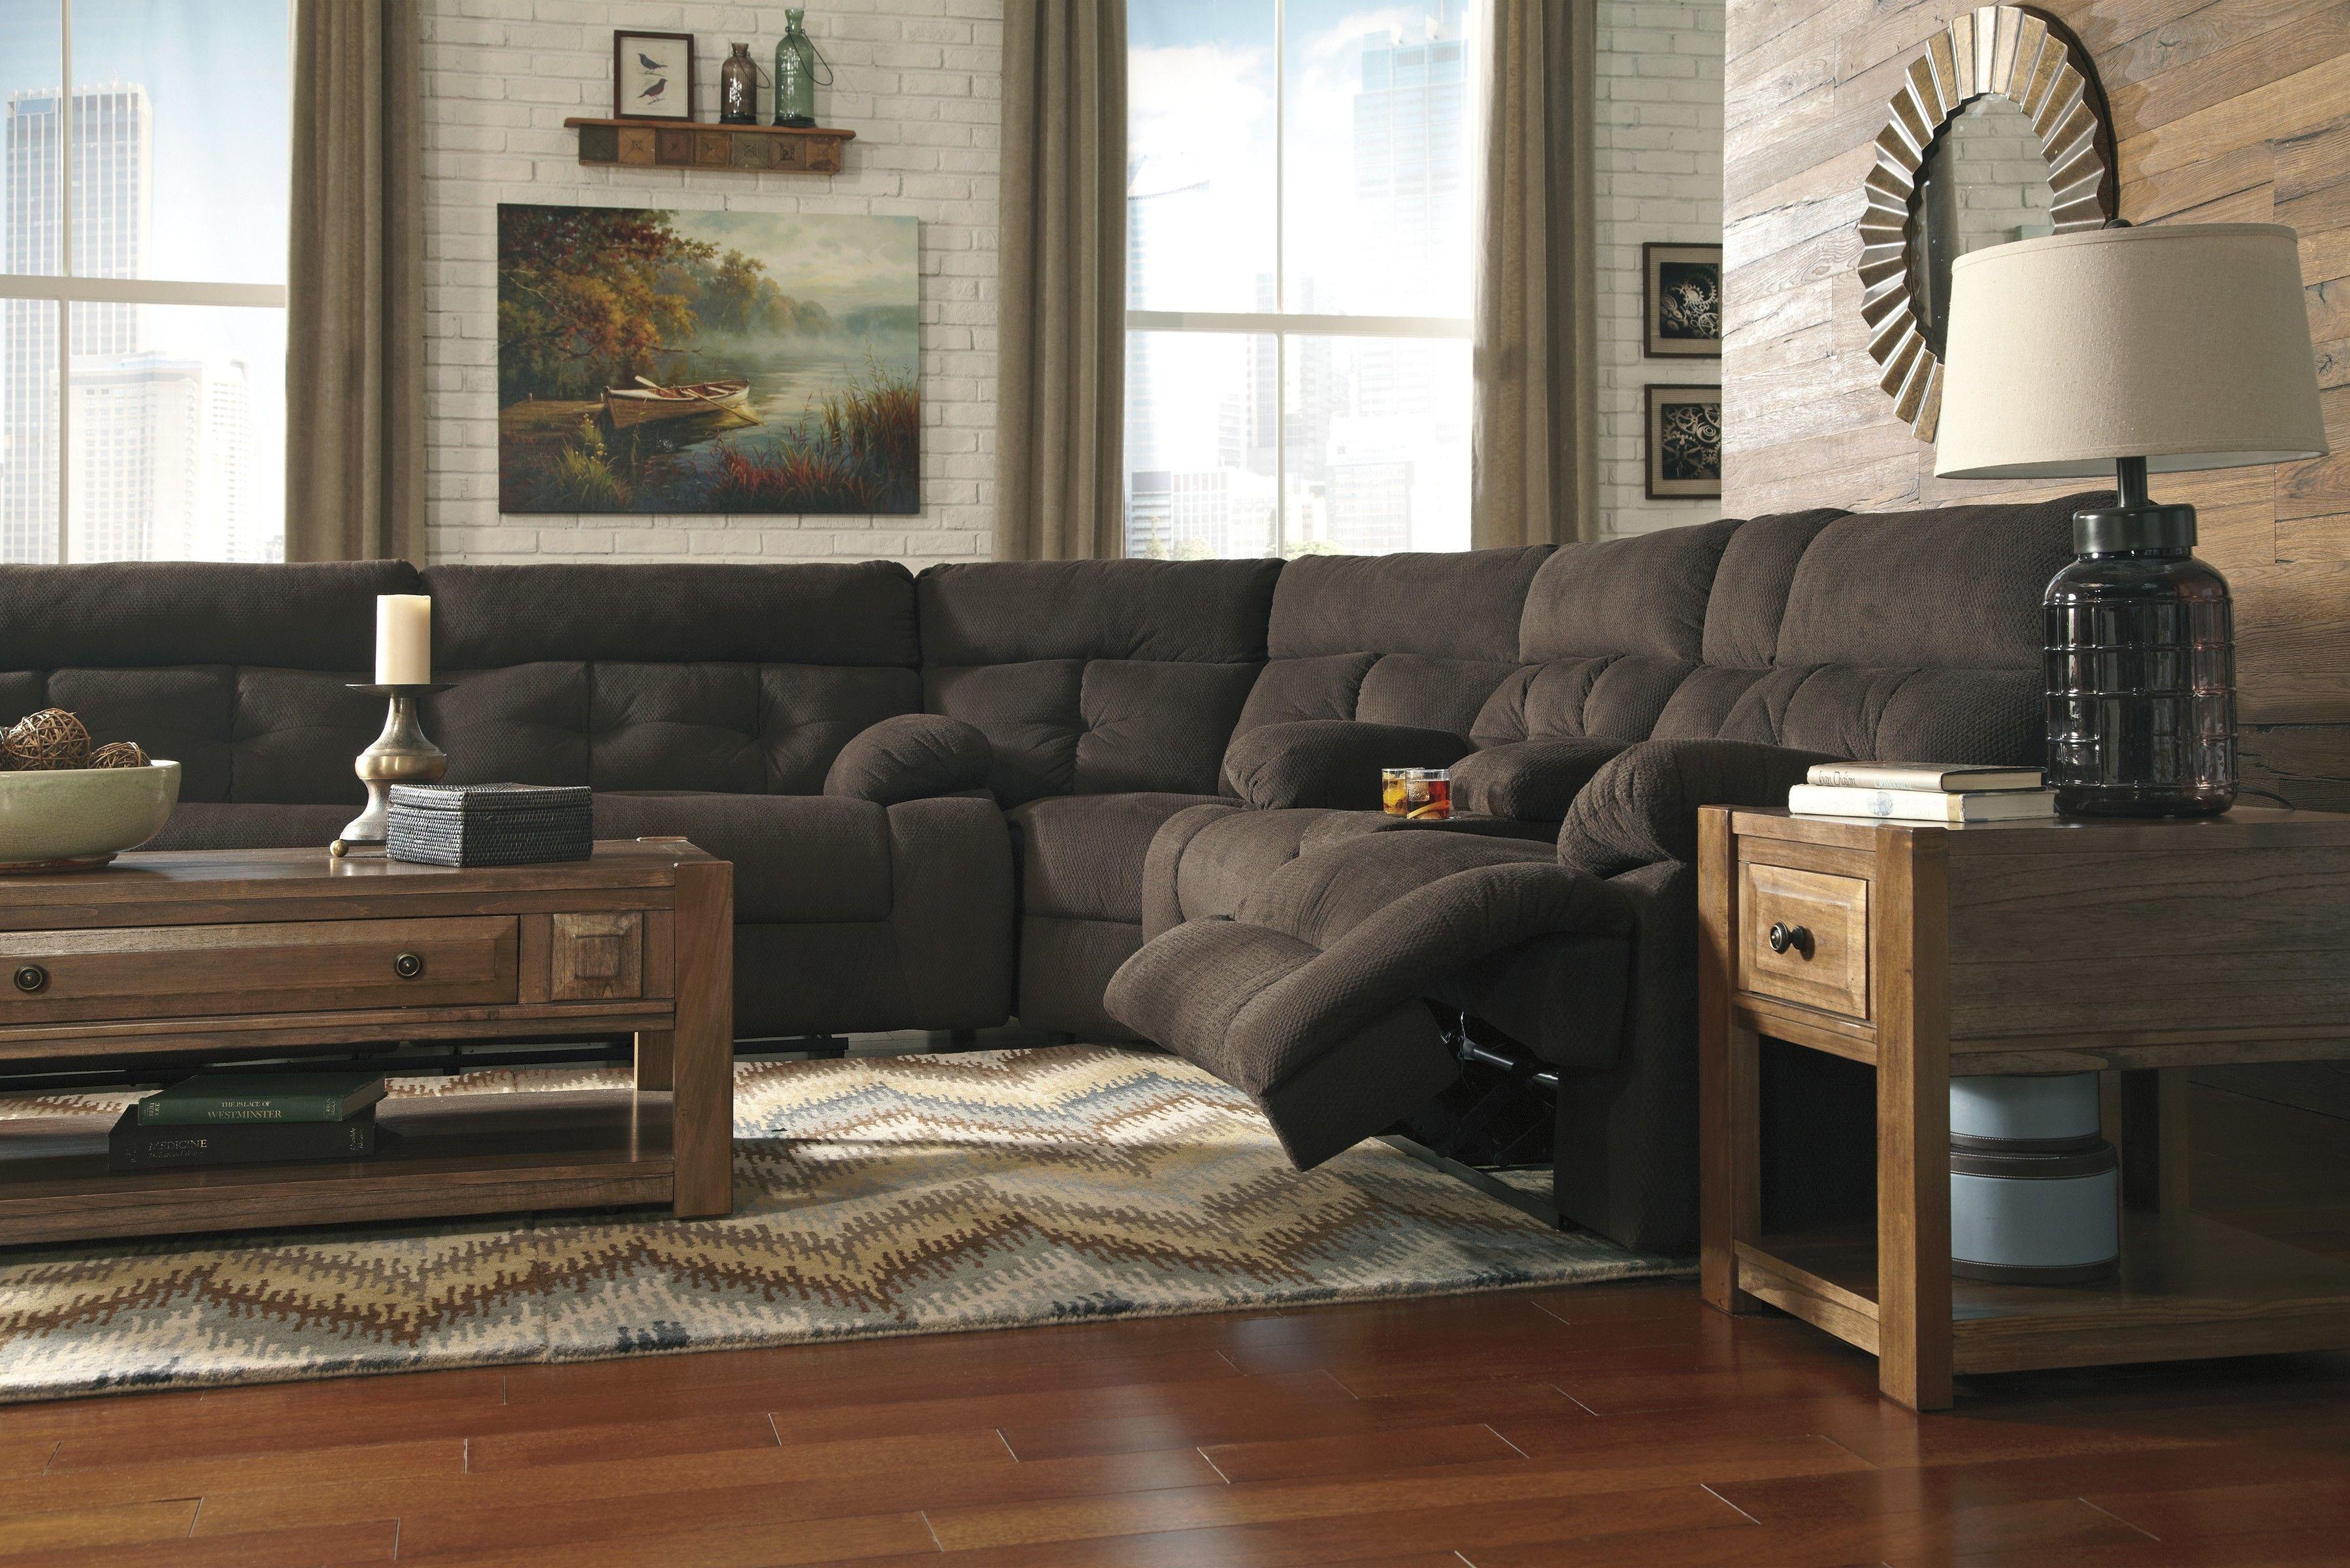 3 Piece Power Recliner Sectional   Chocolate   Sam Levitz Furniture